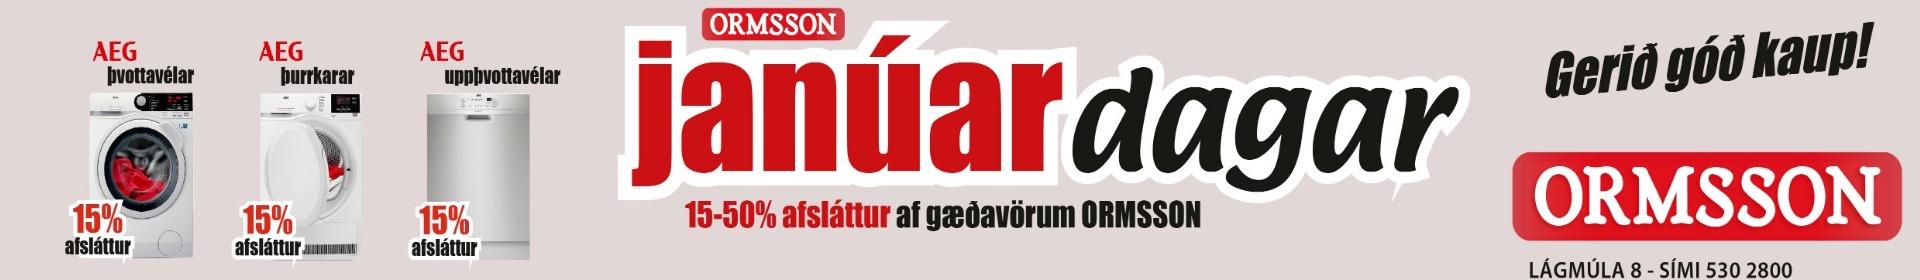 Ormsson janúardagar 2019